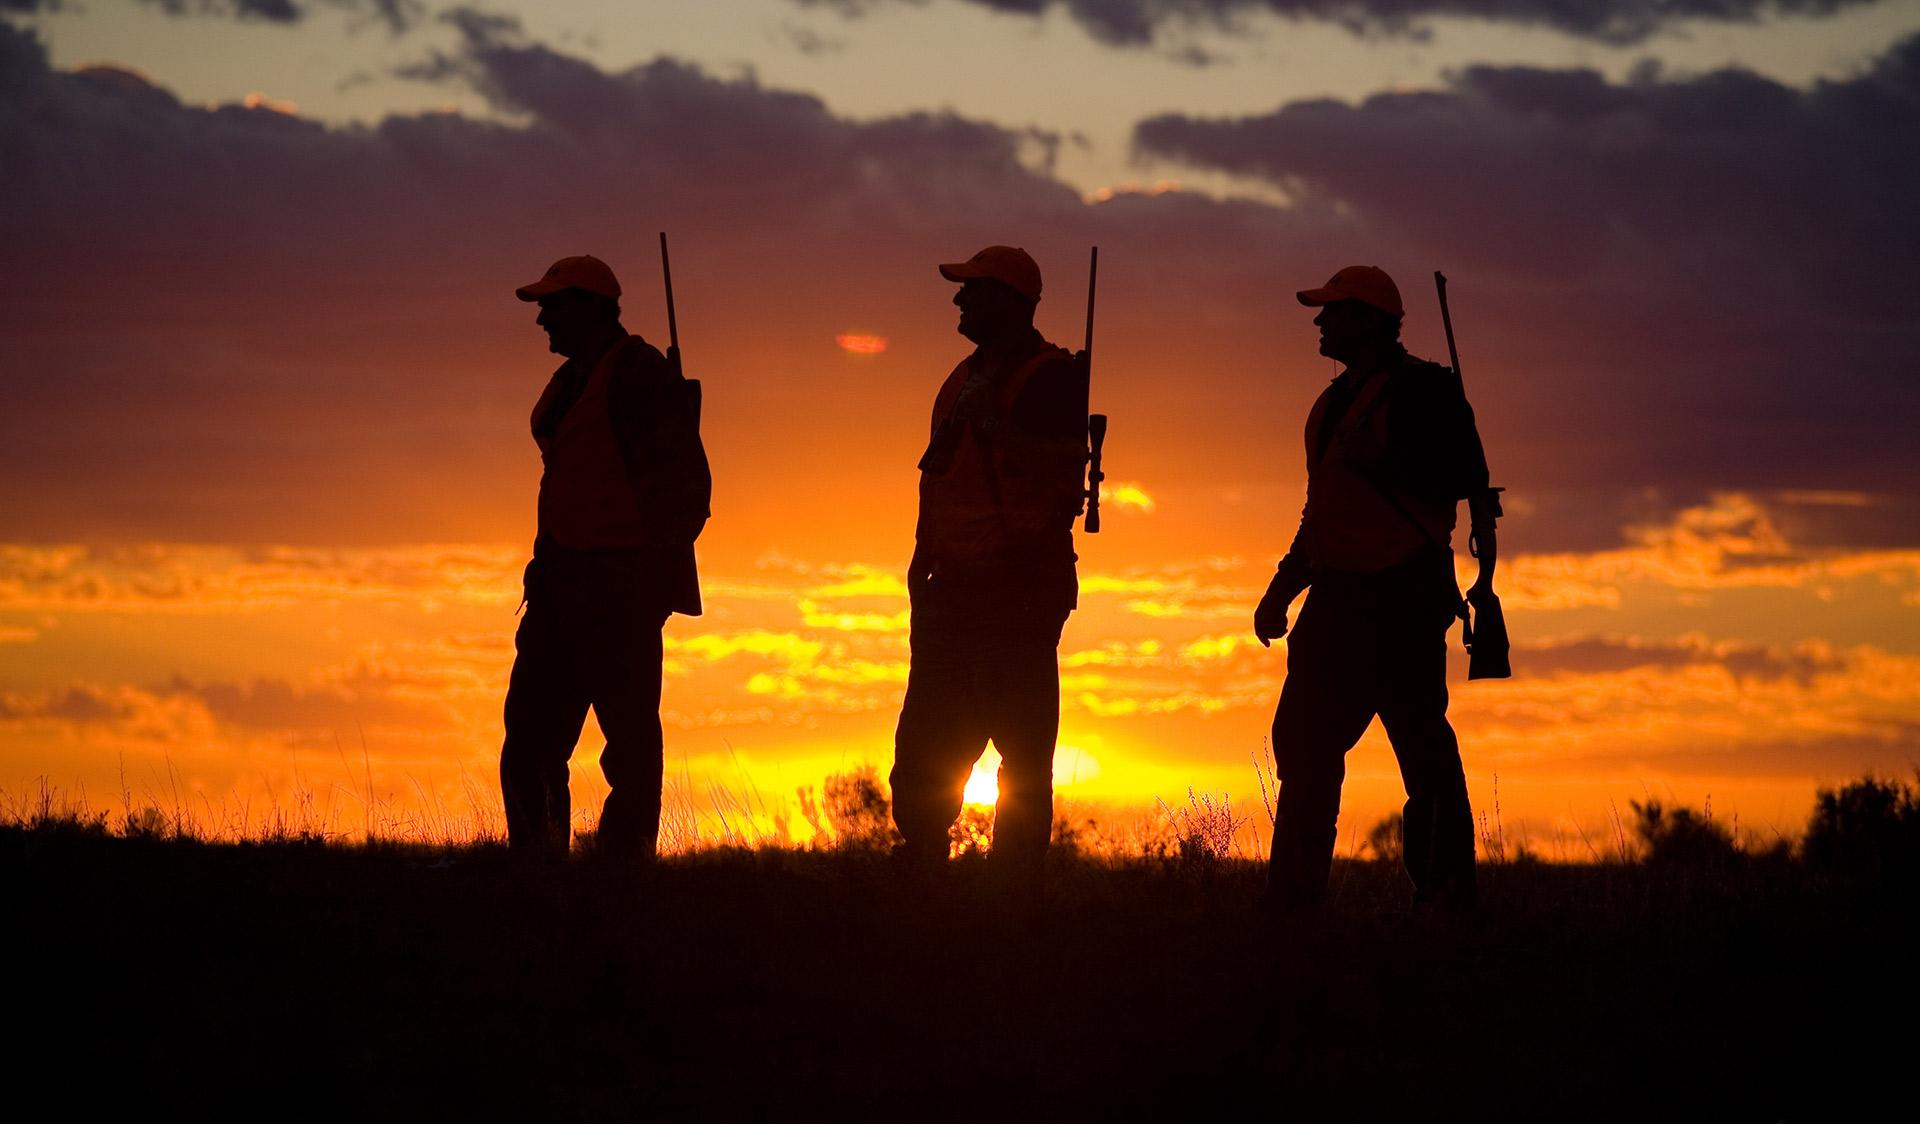 Lov na slikama i videu - Page 11 3-hunting-murray-sunset-national-park-1920x1124